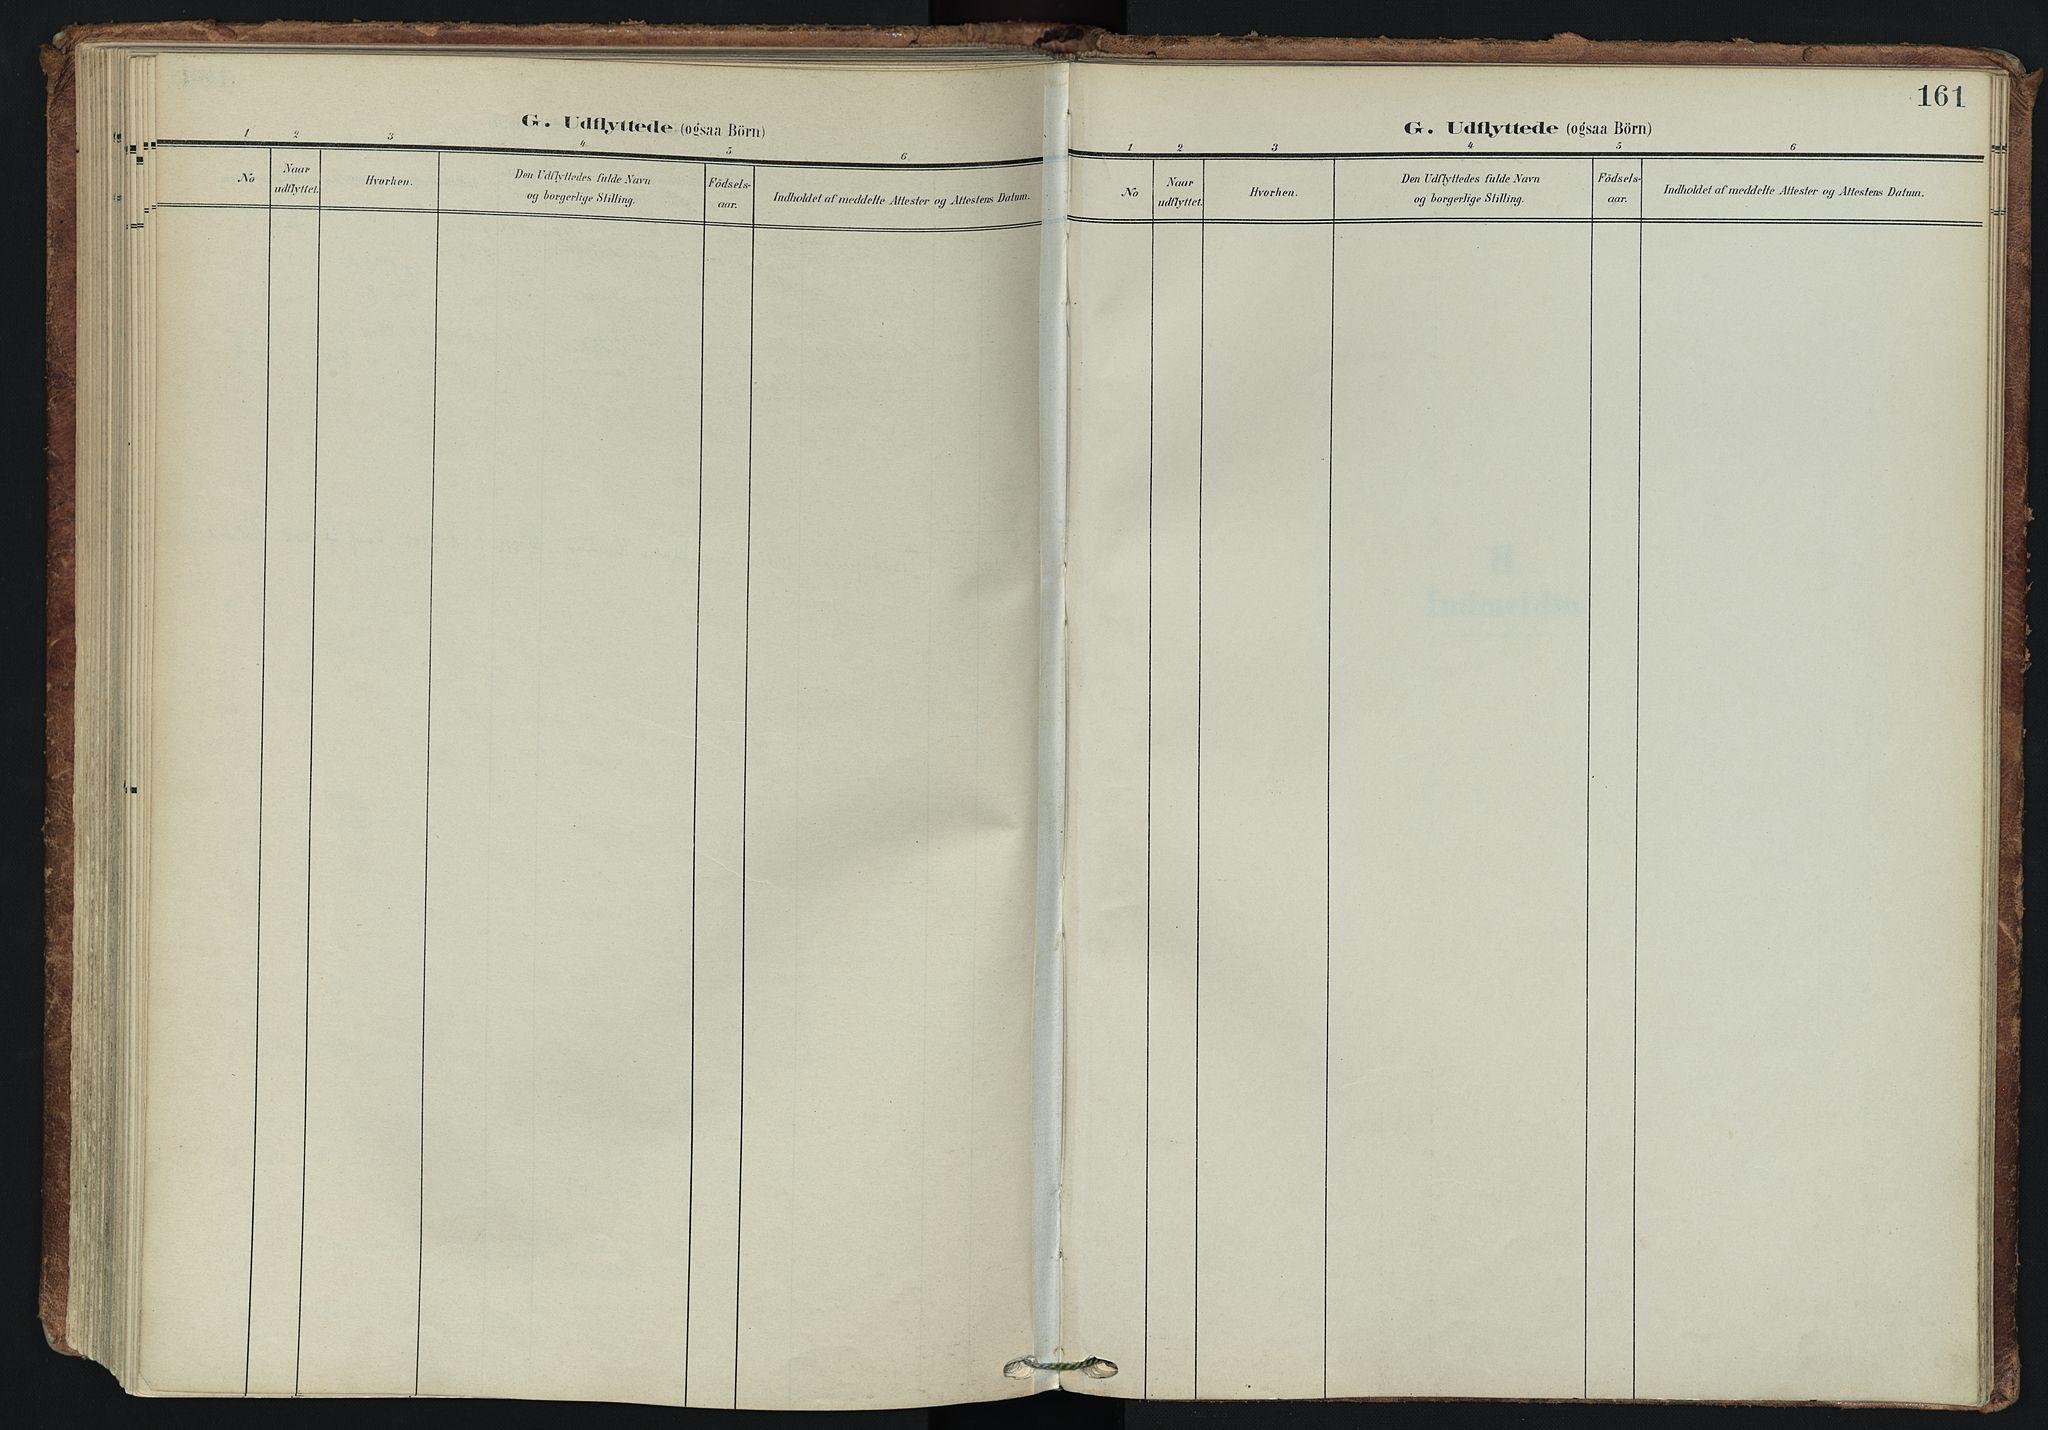 SATØ, Tranøy sokneprestkontor, I/Ia/Iaa/L0014kirke: Ministerialbok nr. 14, 1905-1919, s. 161